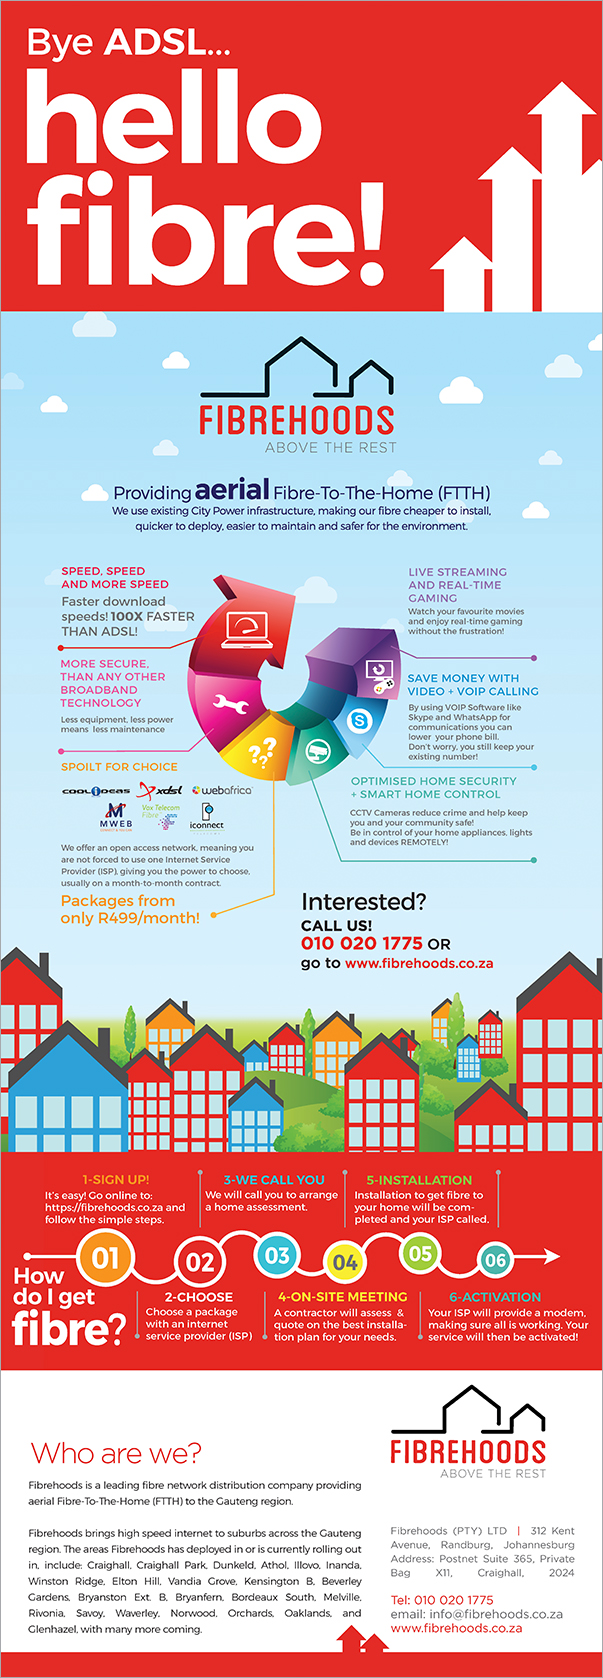 Fibrehoods infographic flyer E-DOC